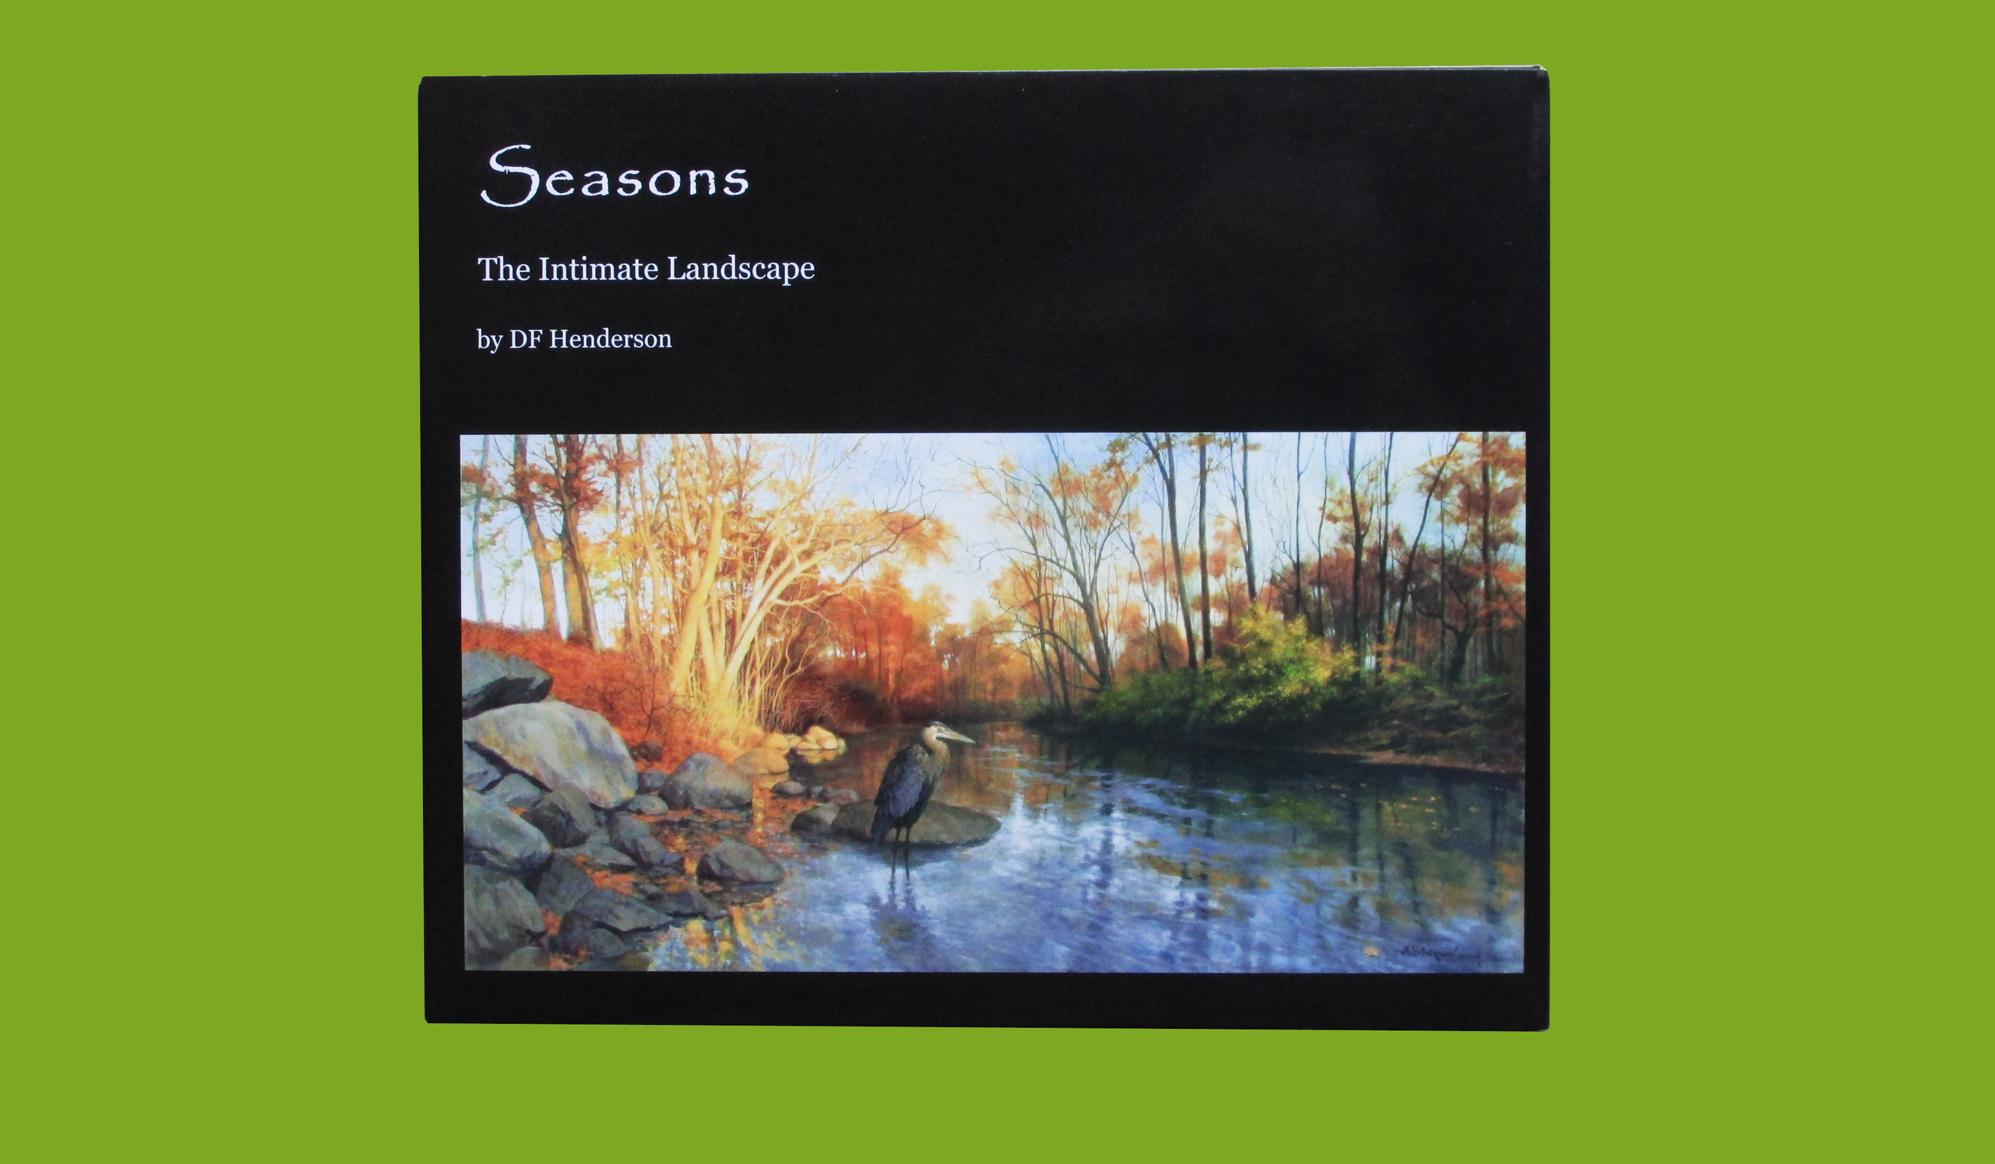 Seasons Book Cover.jpg